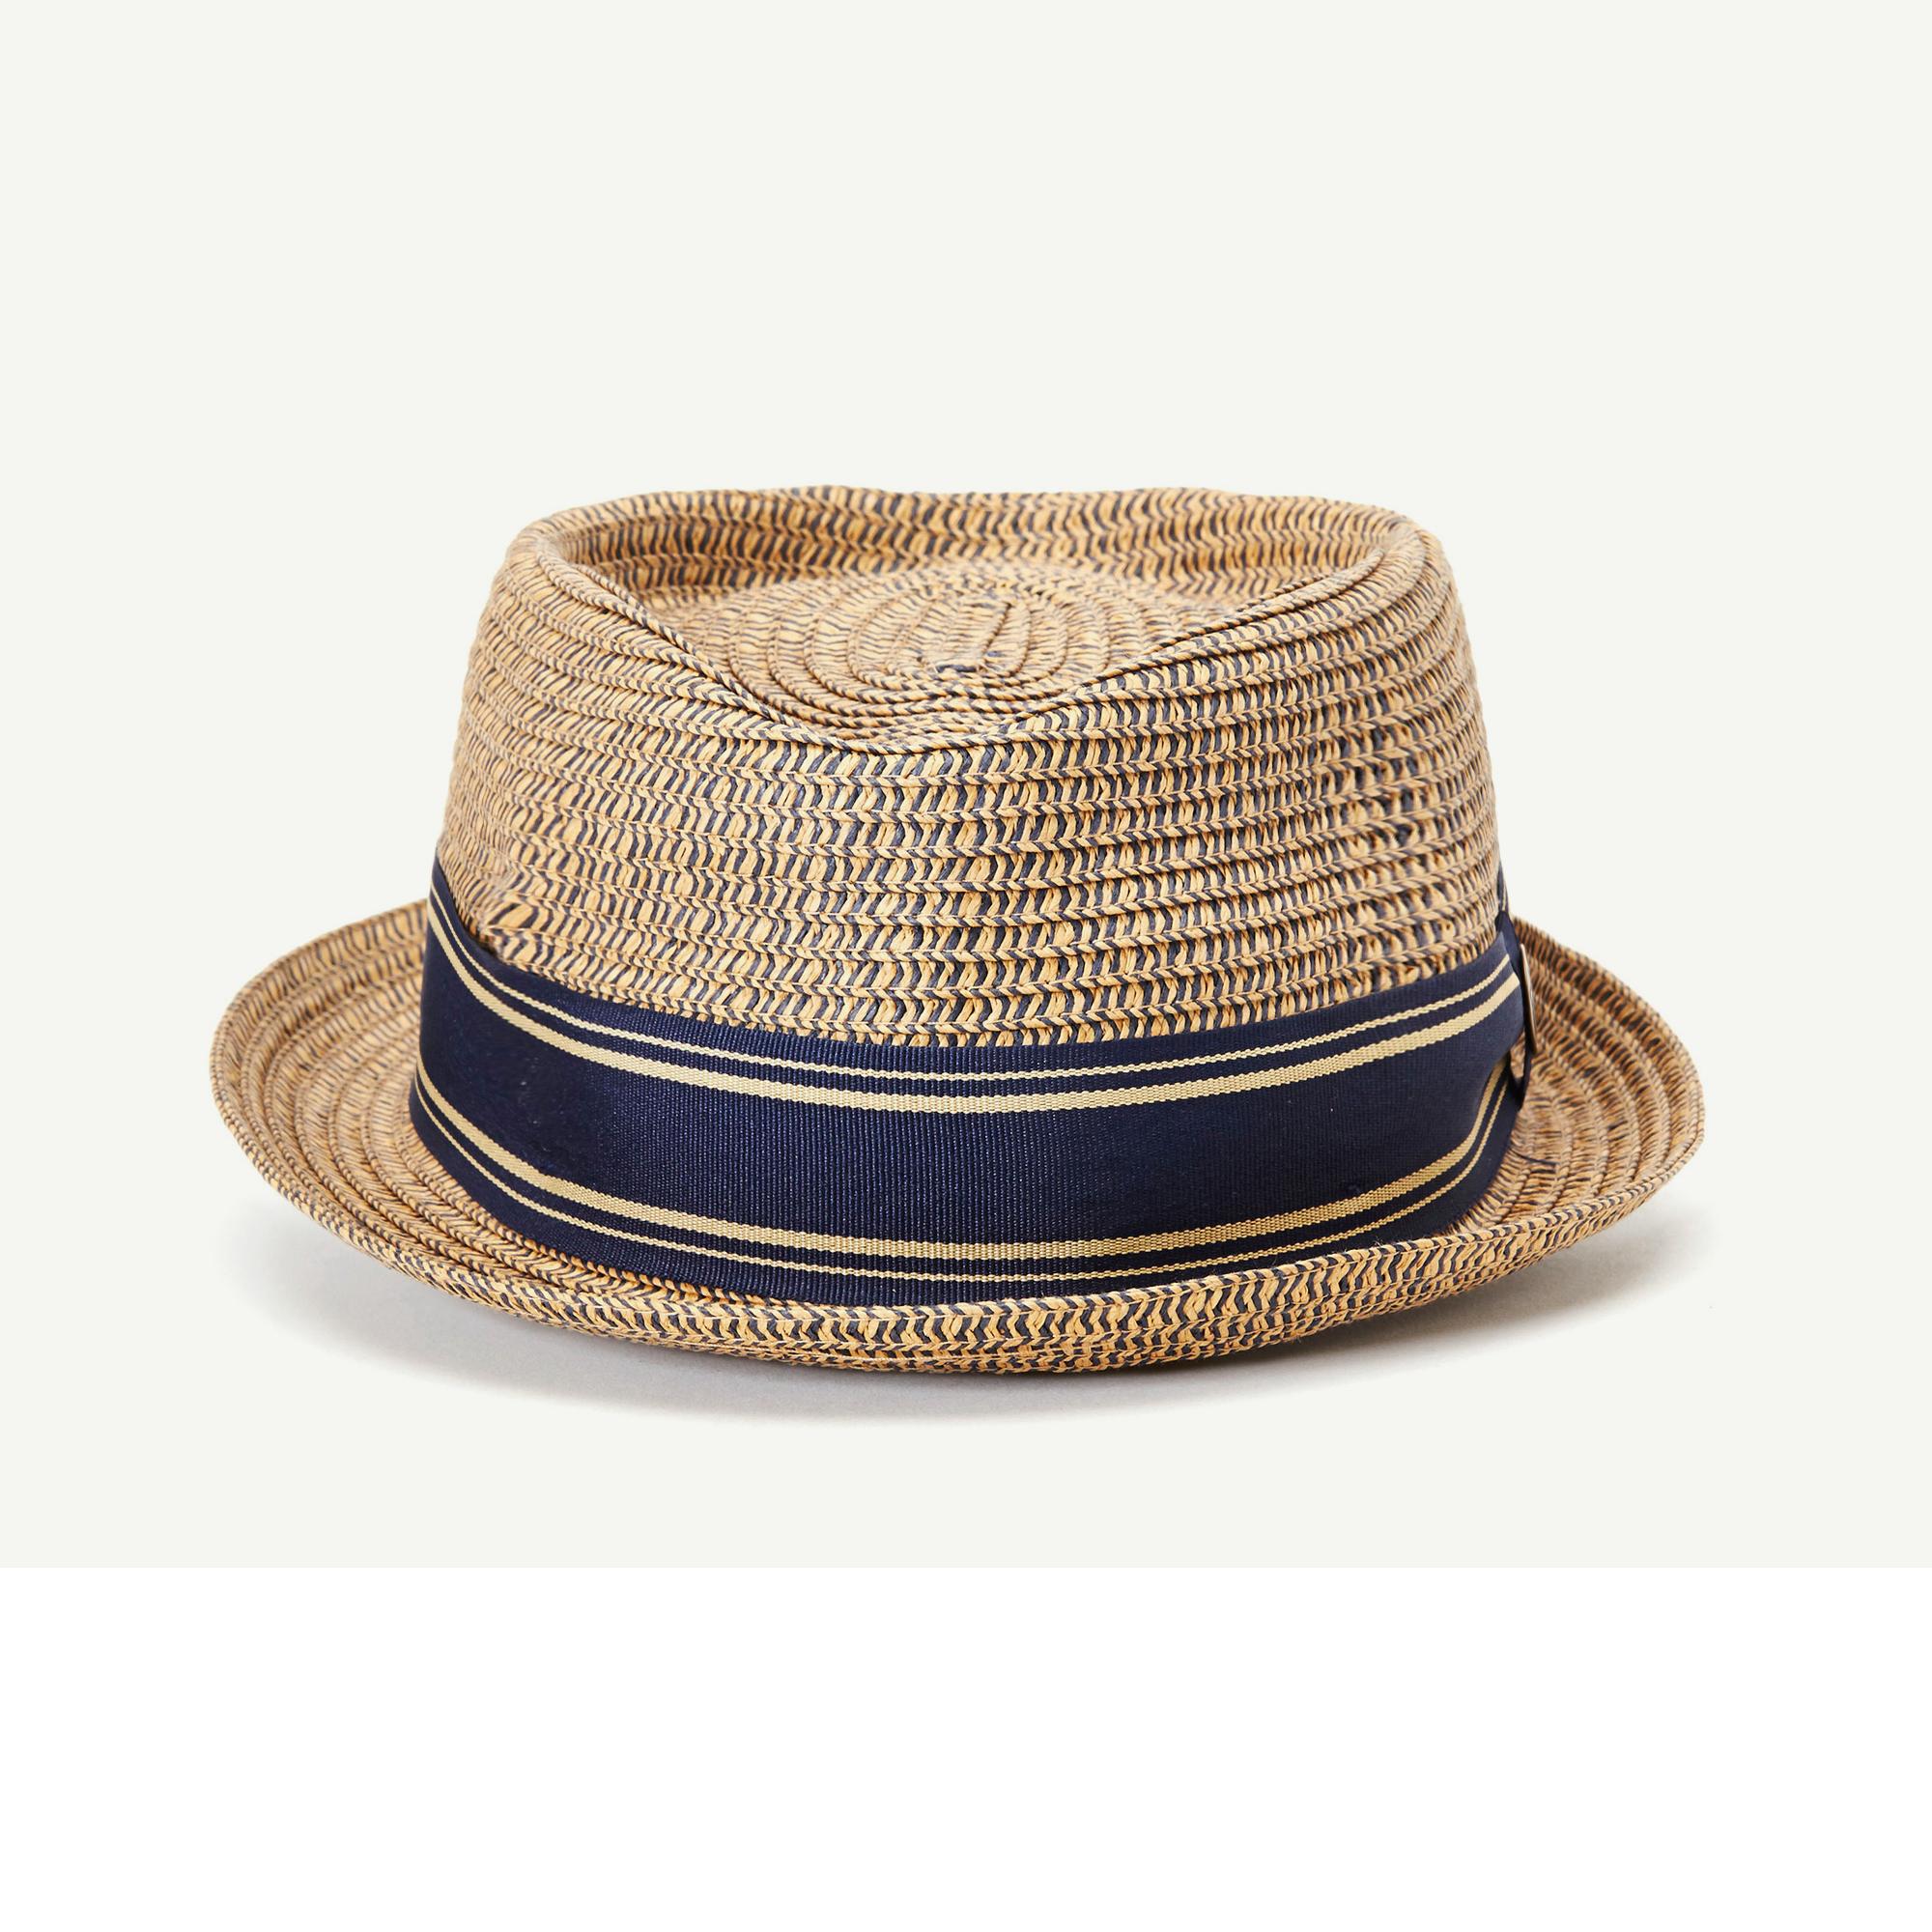 70203f660 Big Boy Kris in 2019 | Men's fashion | Hats, Hats for men, Fadora hats